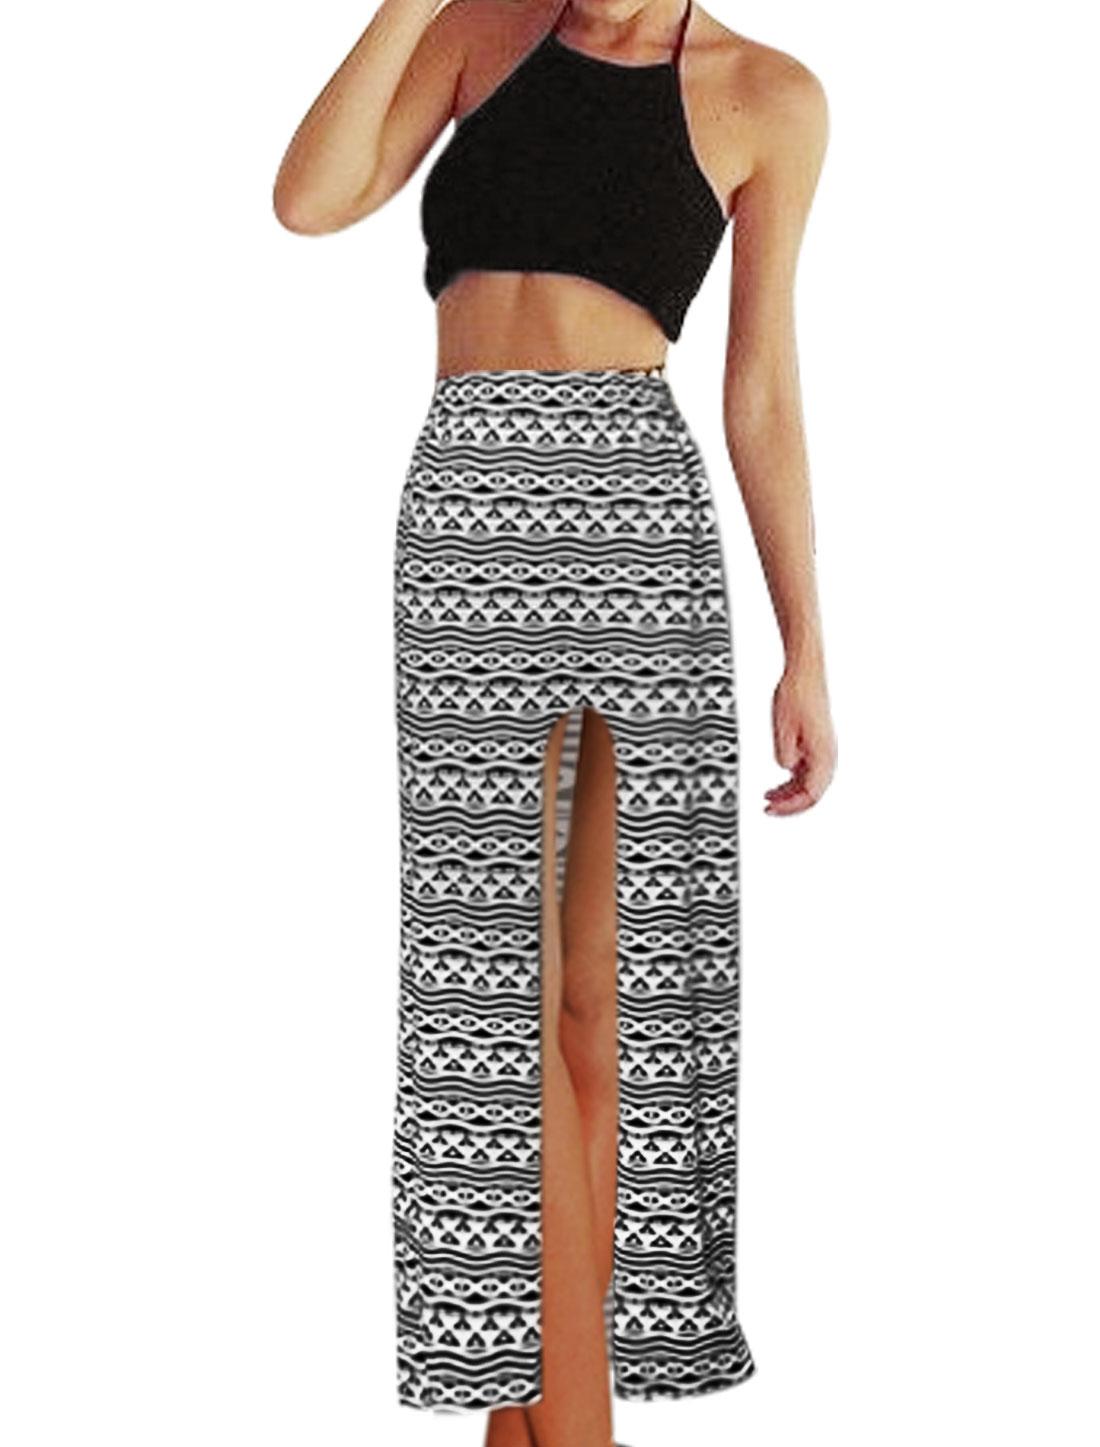 Women Halter Neck Crop Top w Geometric Print Side Split Skirt Sets Black M